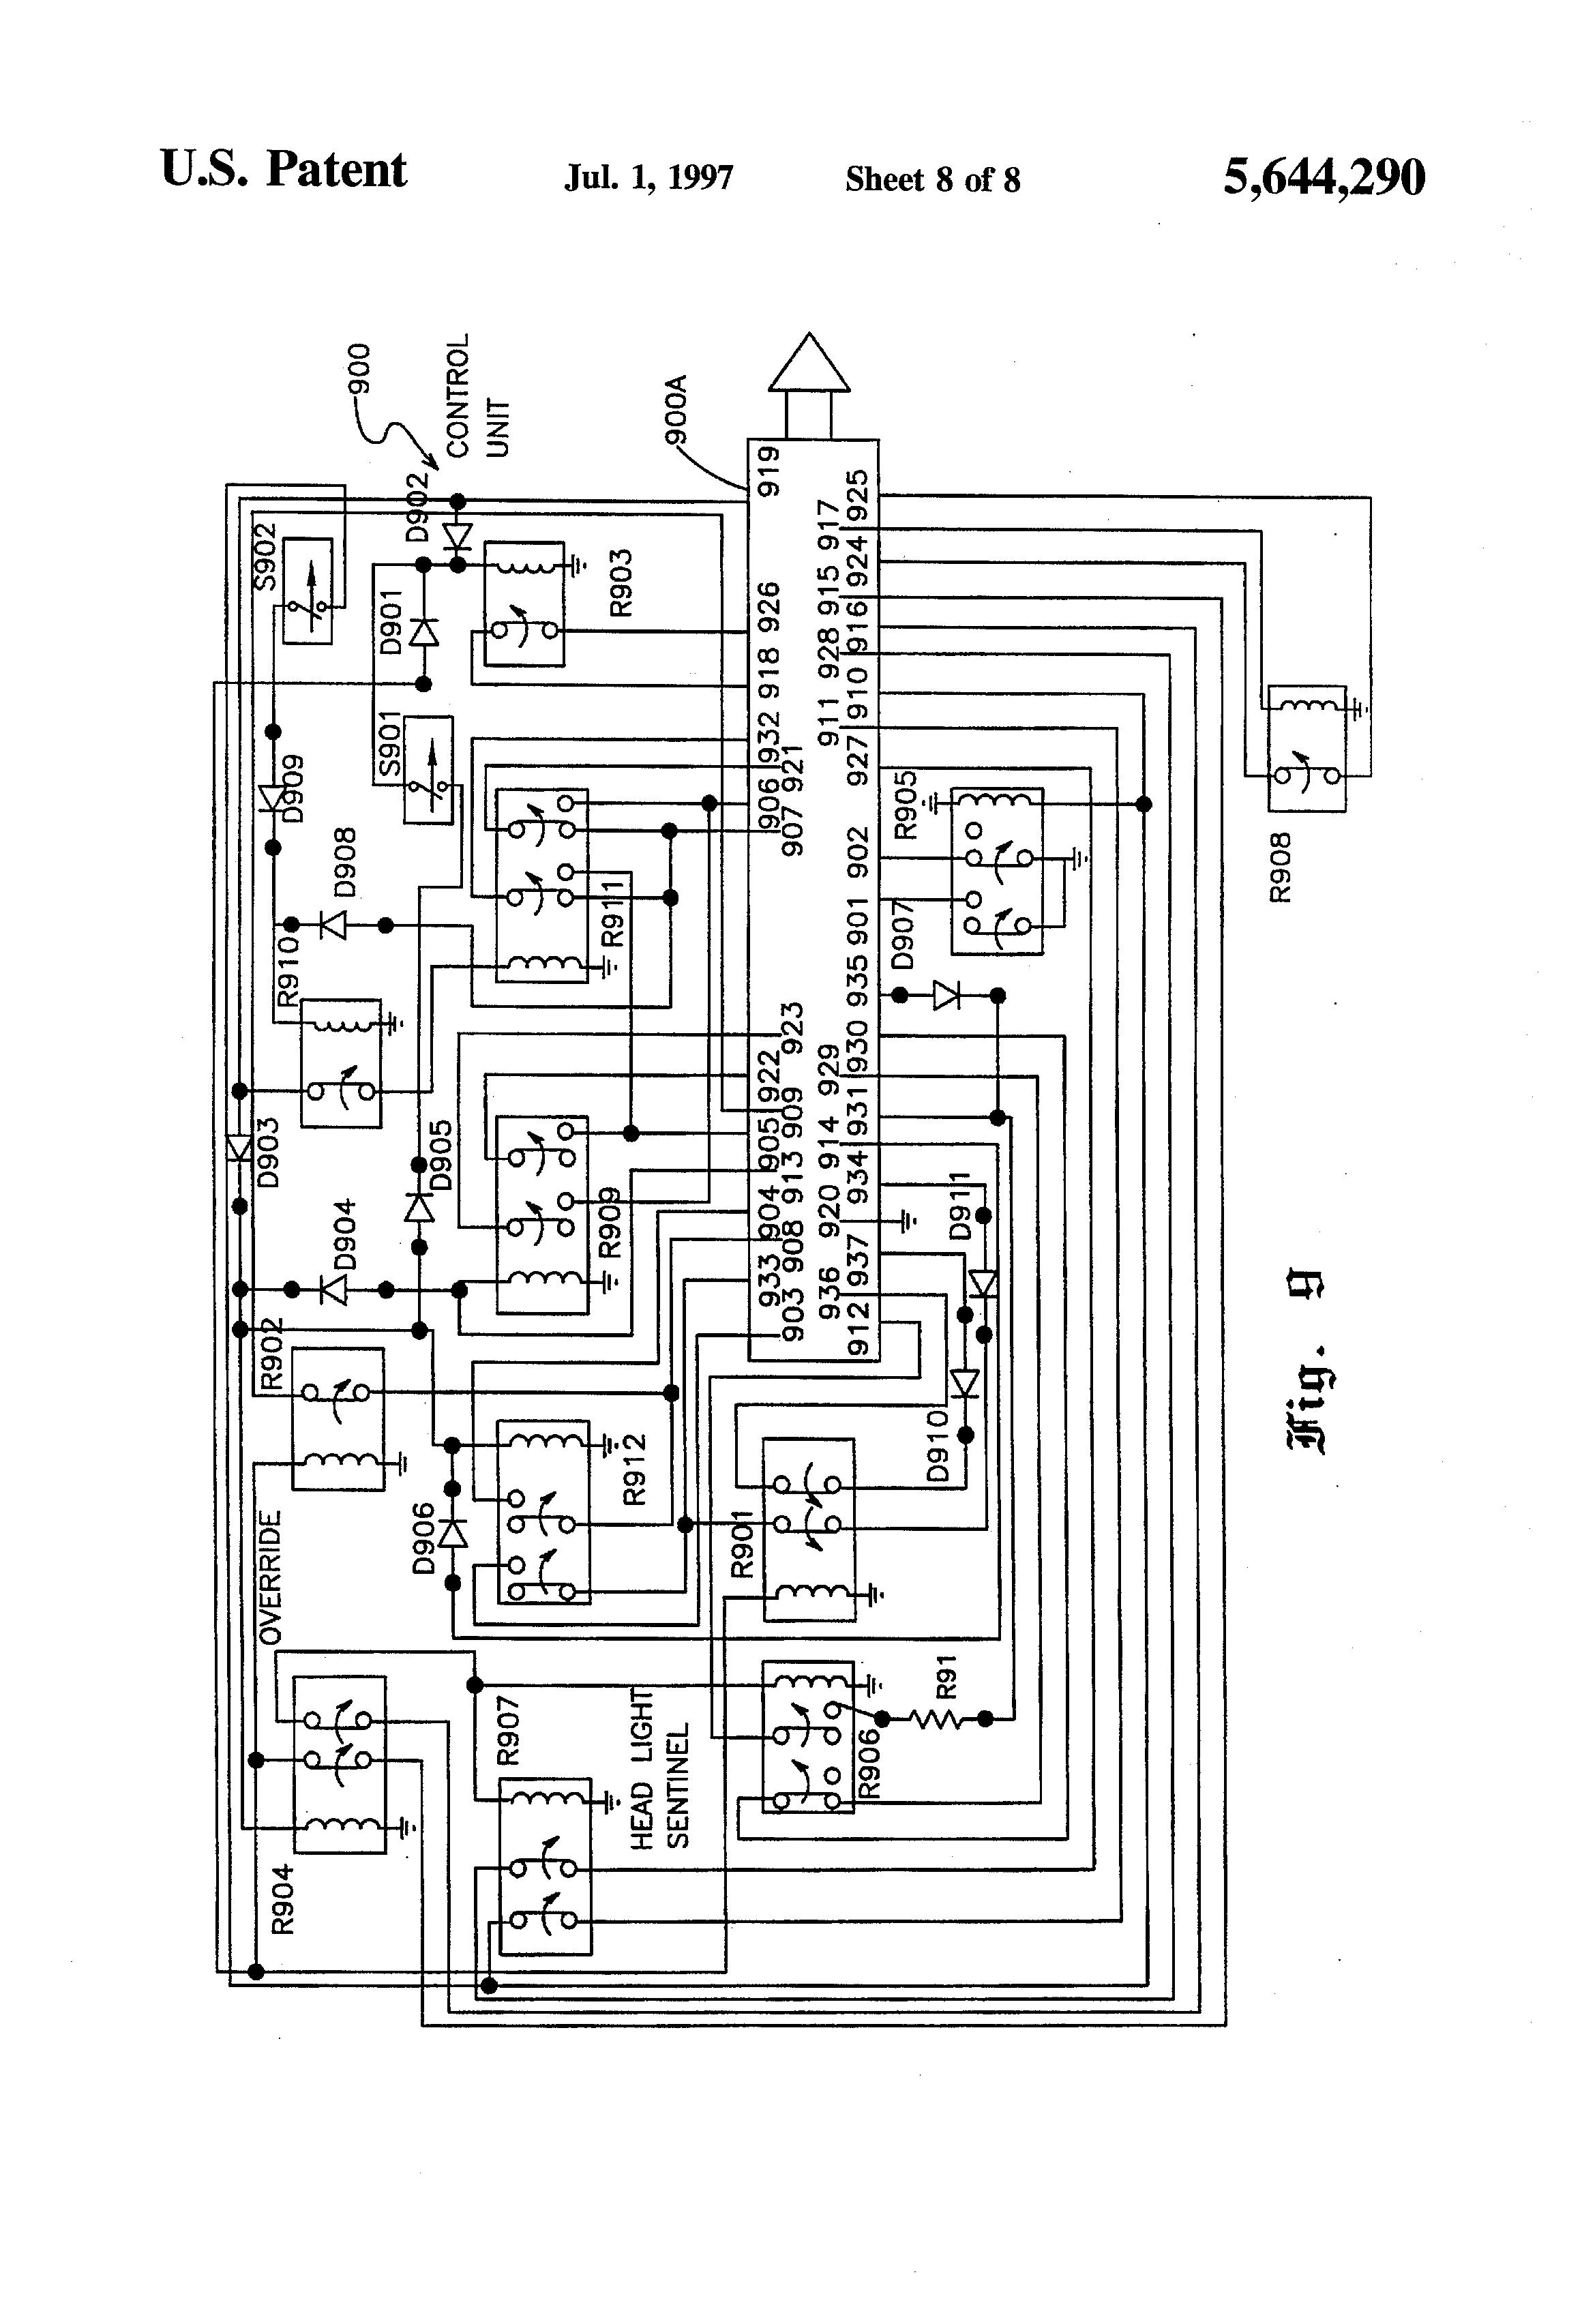 Patent Us5644290 - Blackout Control System